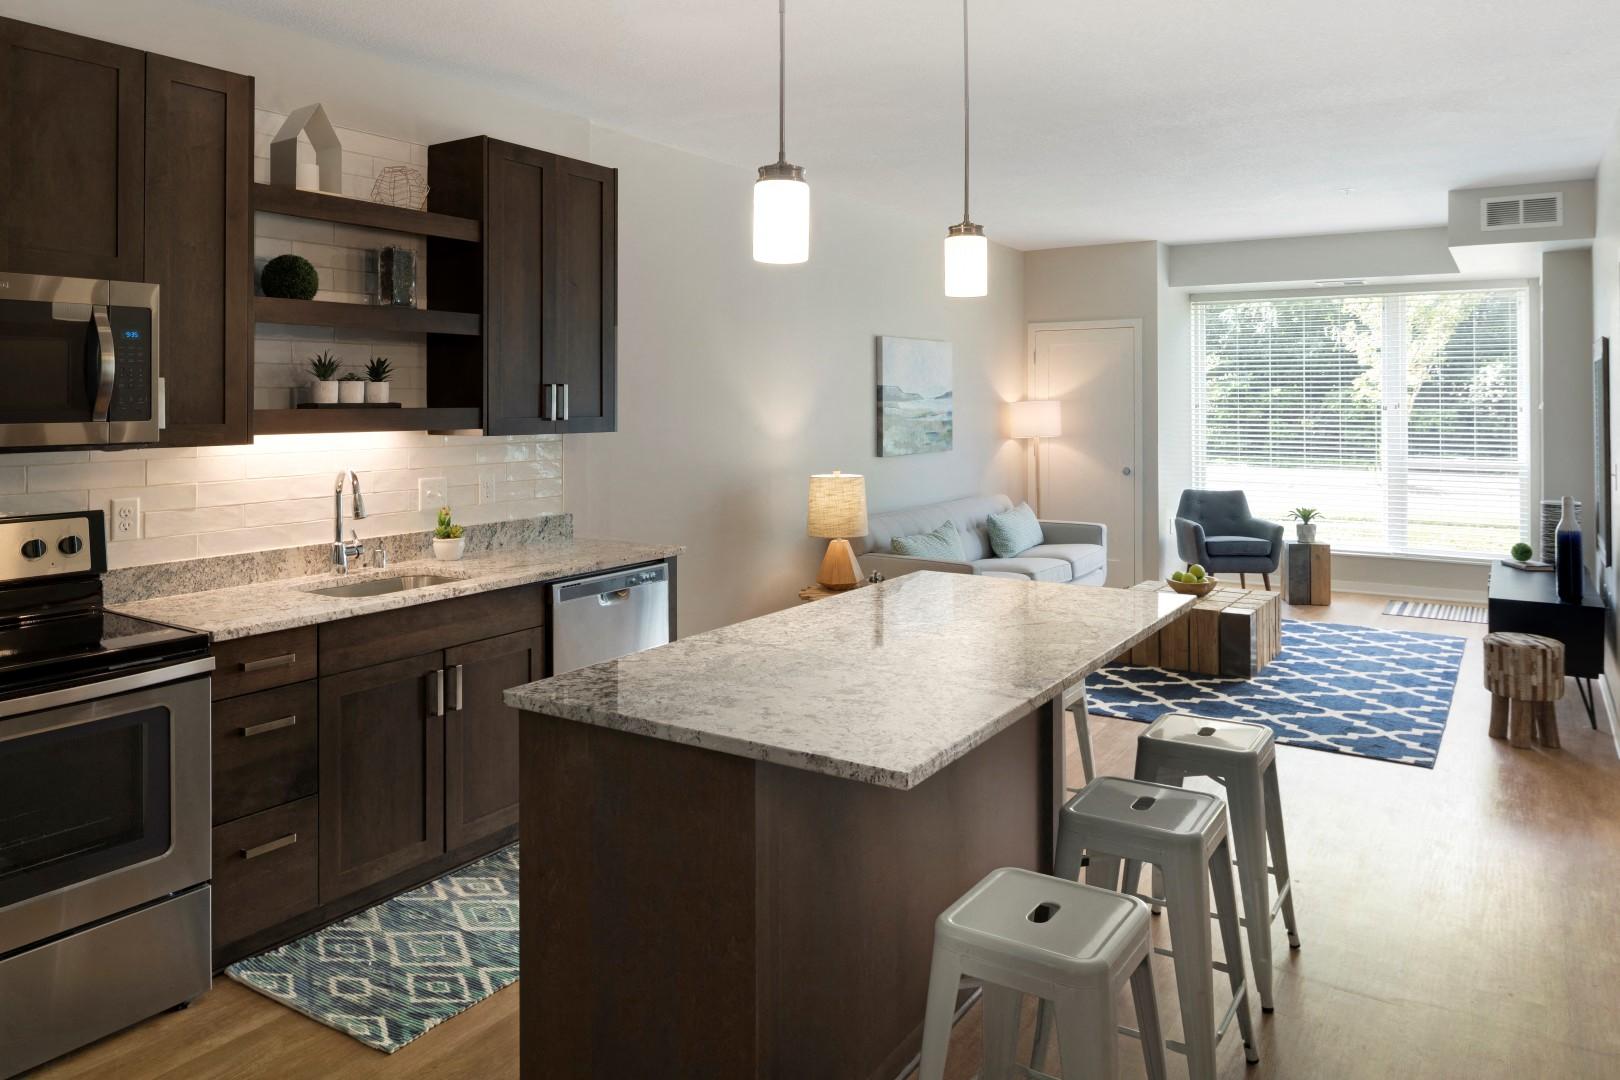 The McMillan Shoreview Model 108 Kitchen